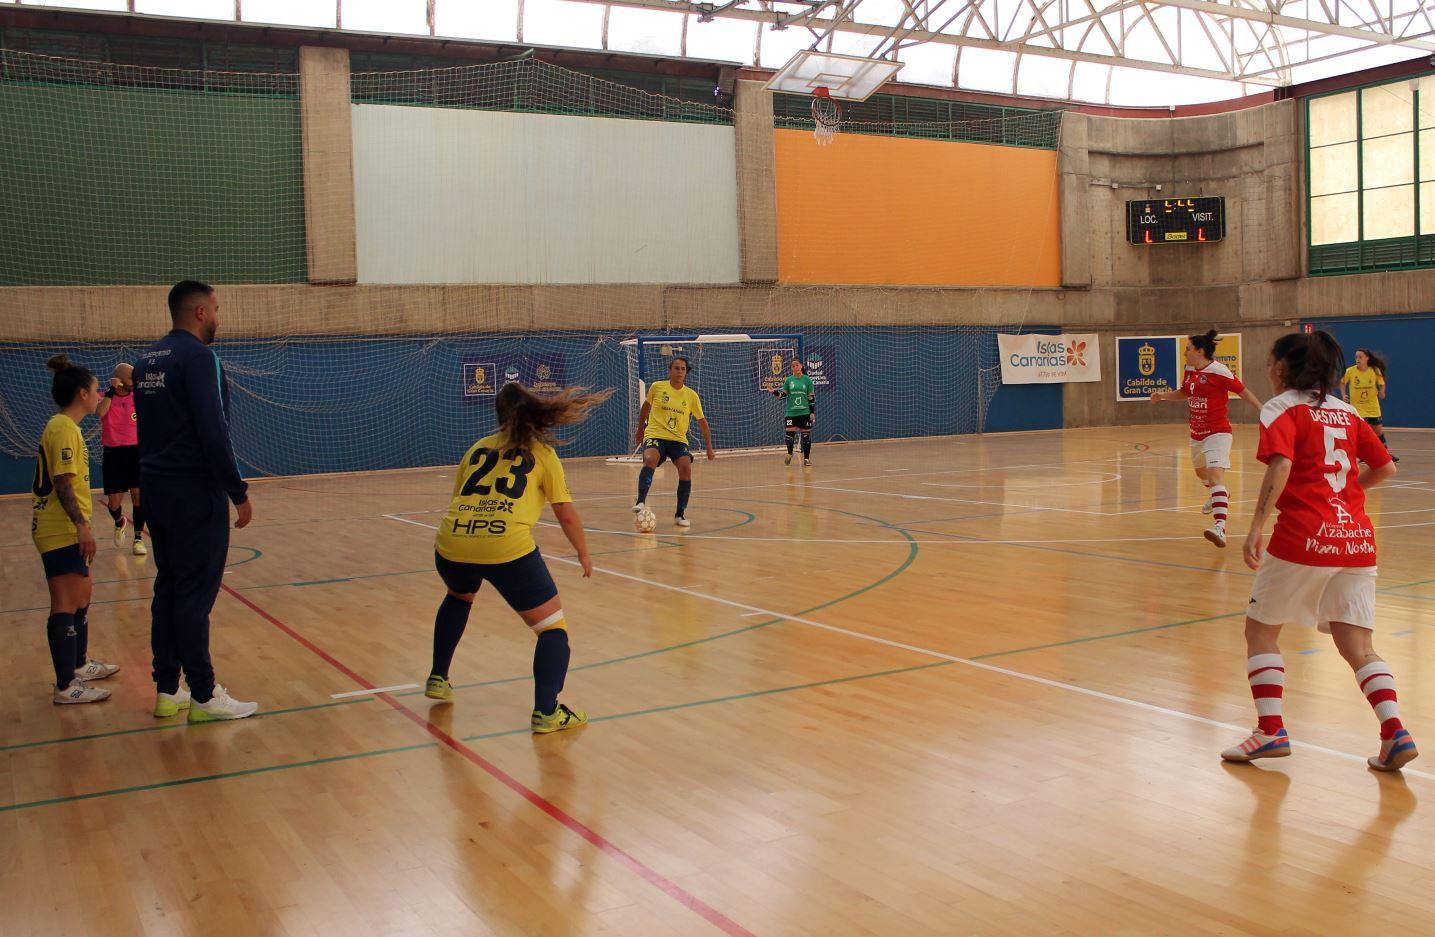 Crónica del Partido: Gran Canaria Teldeportivo B - Colme Futsal